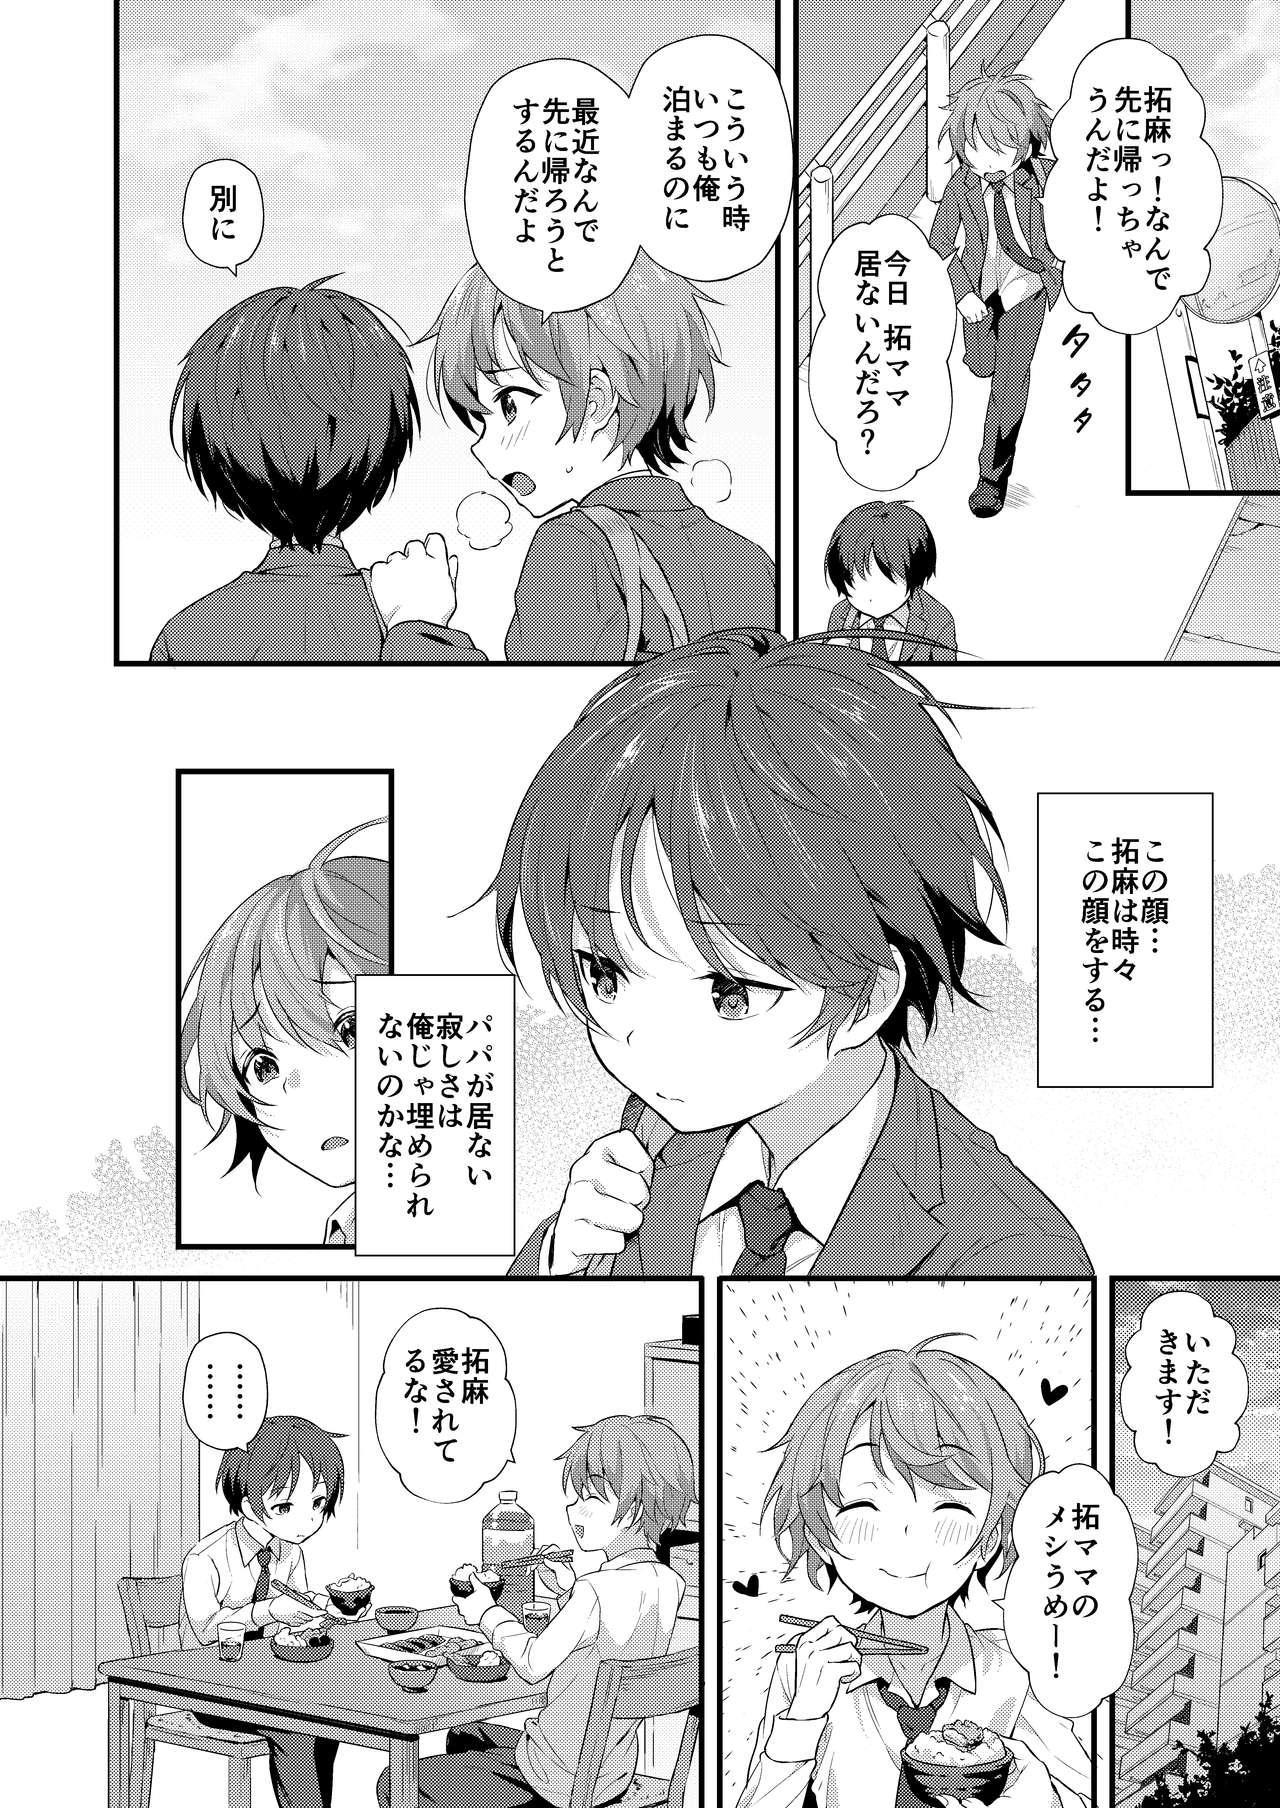 Shota Sextet Vol. 1 6